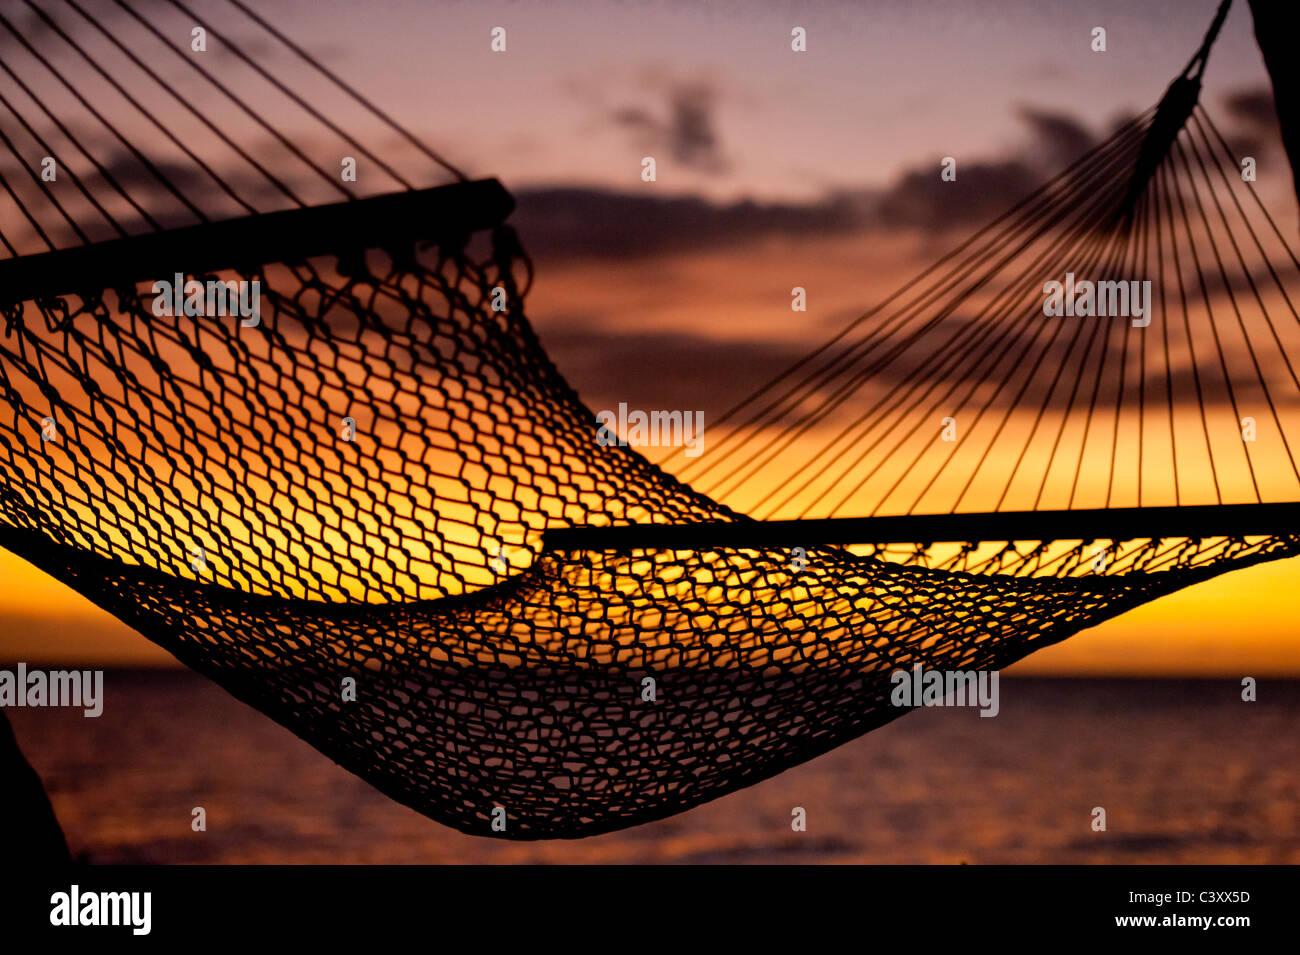 silhouette of hammock on beach overlooking ocean at sunset - Stock Image